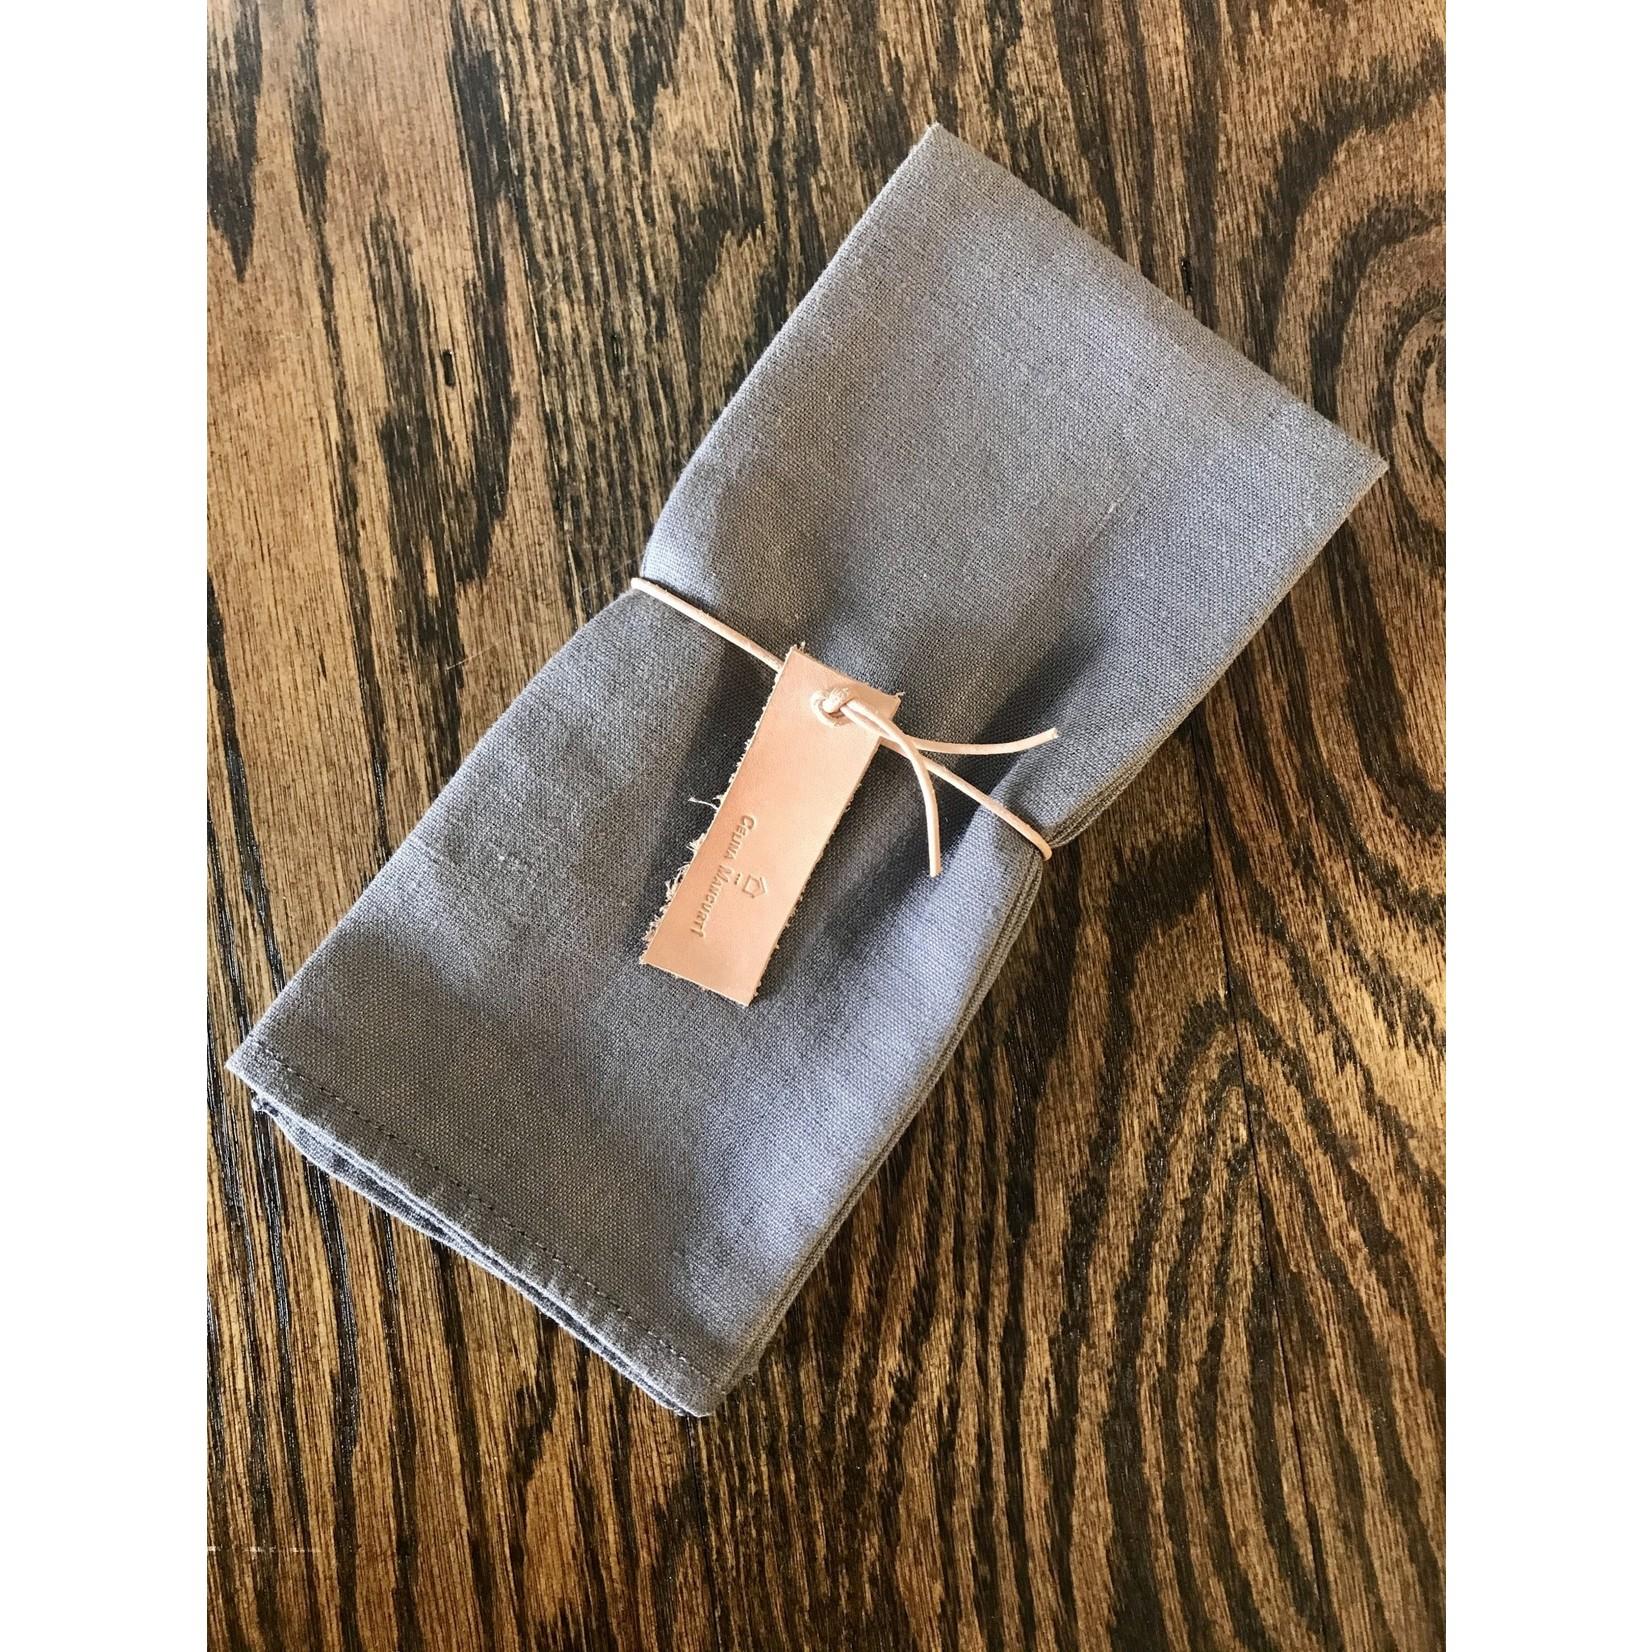 Celina Mancurti (LO) Linen Napkin Sets of 2